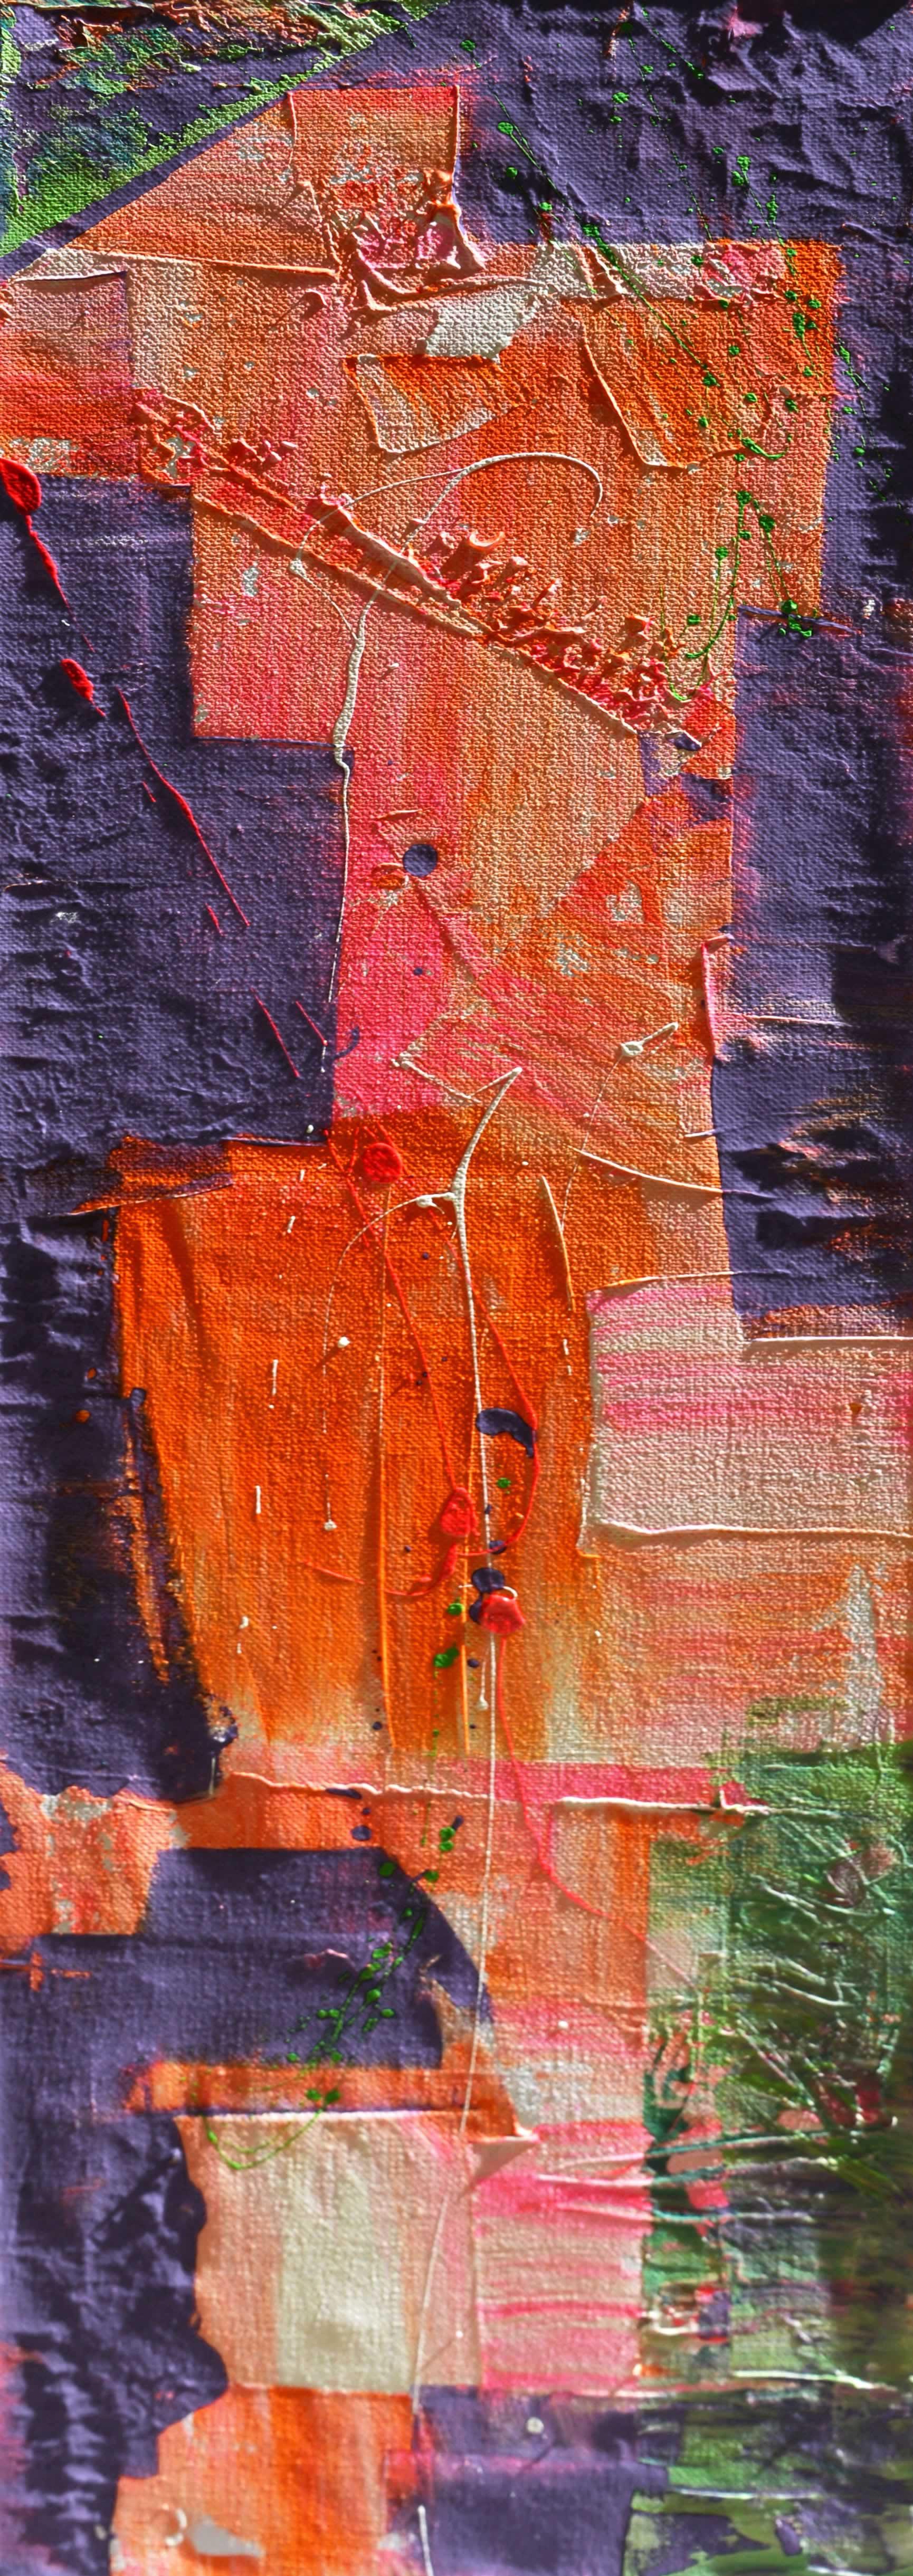 Kunstblog aichele arts